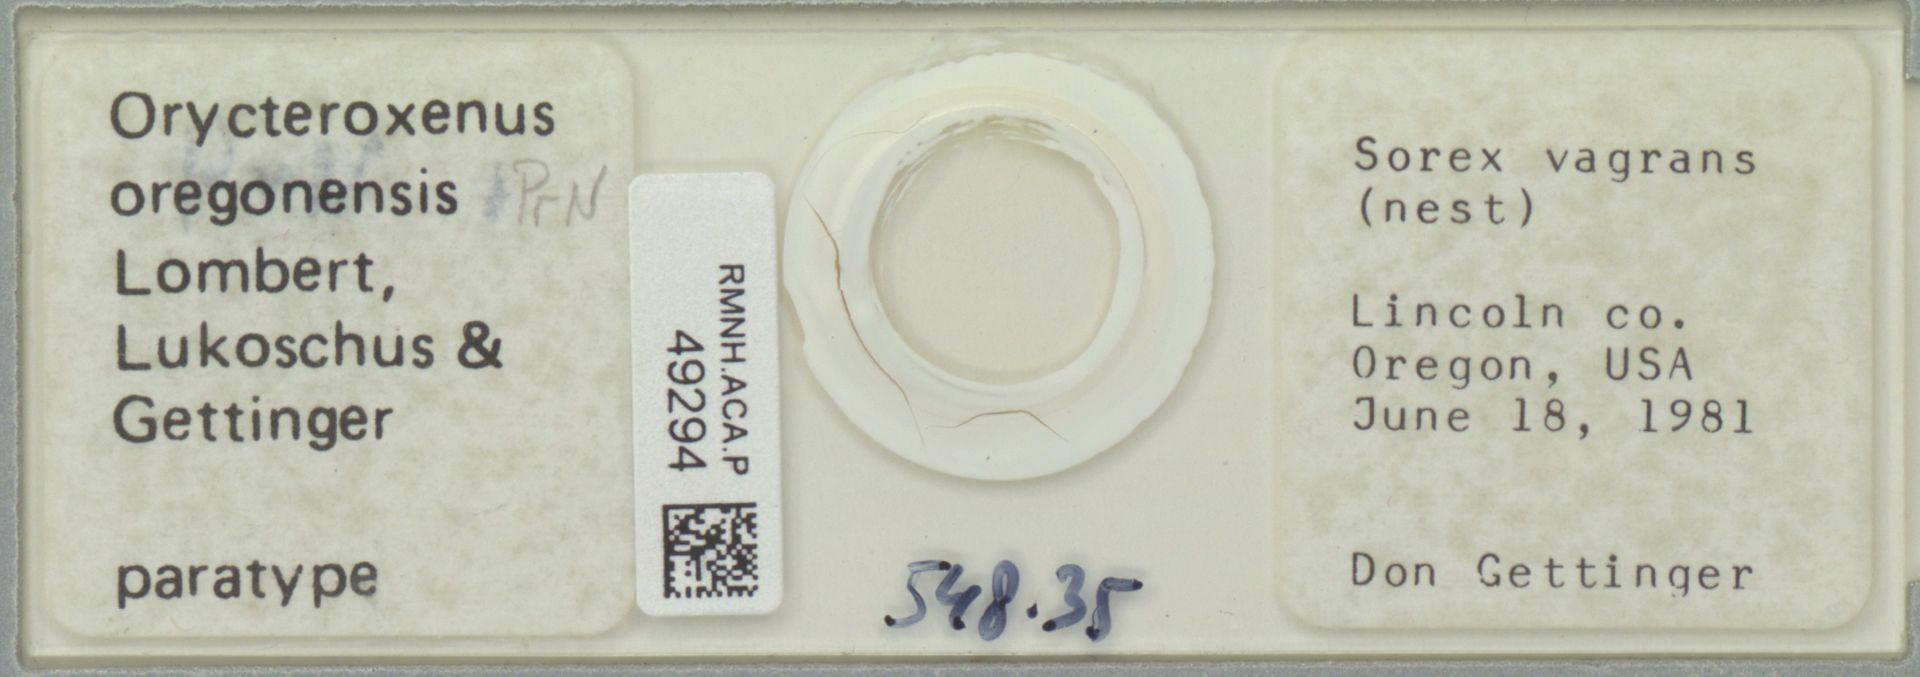 RMNH.ACA.P.49294 | Orycteroxenus oregonensis Lombert, Lukoschus & Gettinger